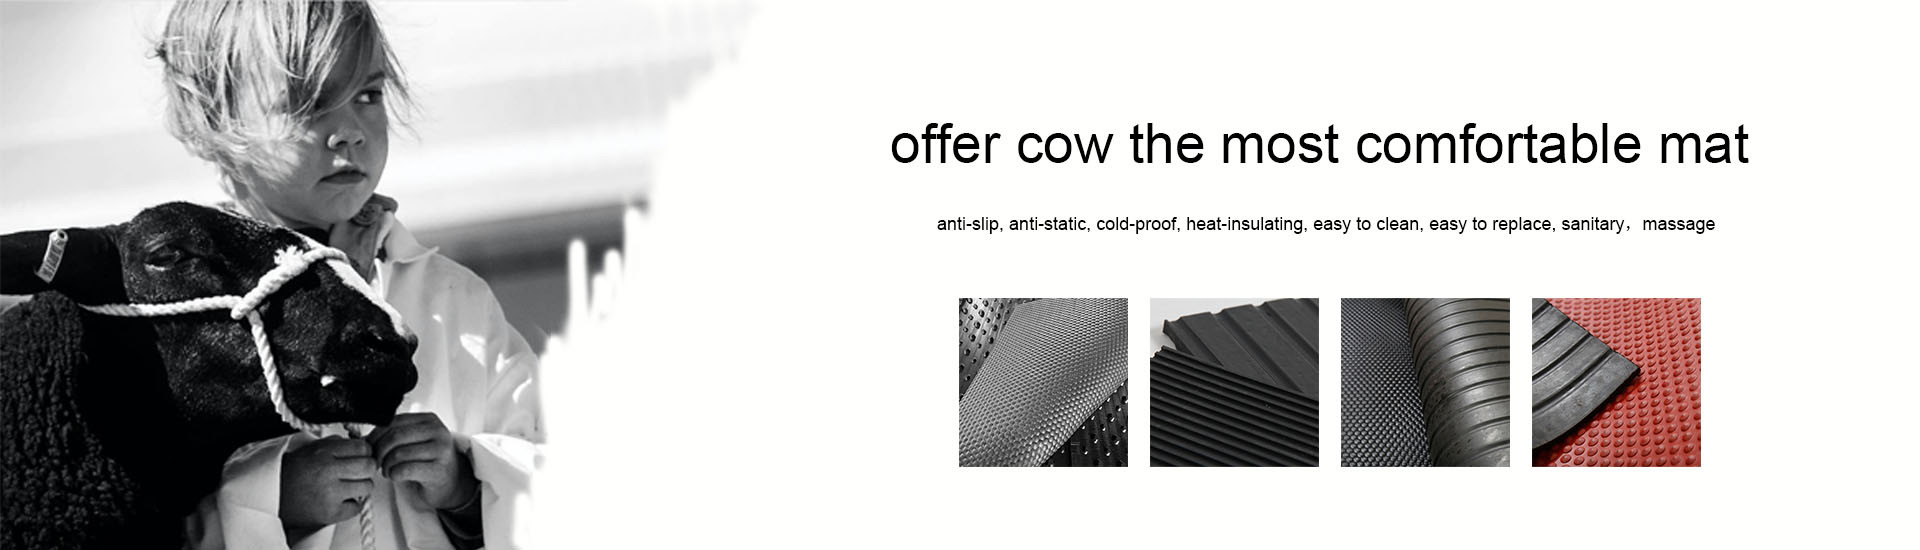 Anti Fatigue Cow Matting Rubber Cushion for horse stable mat cow mattress